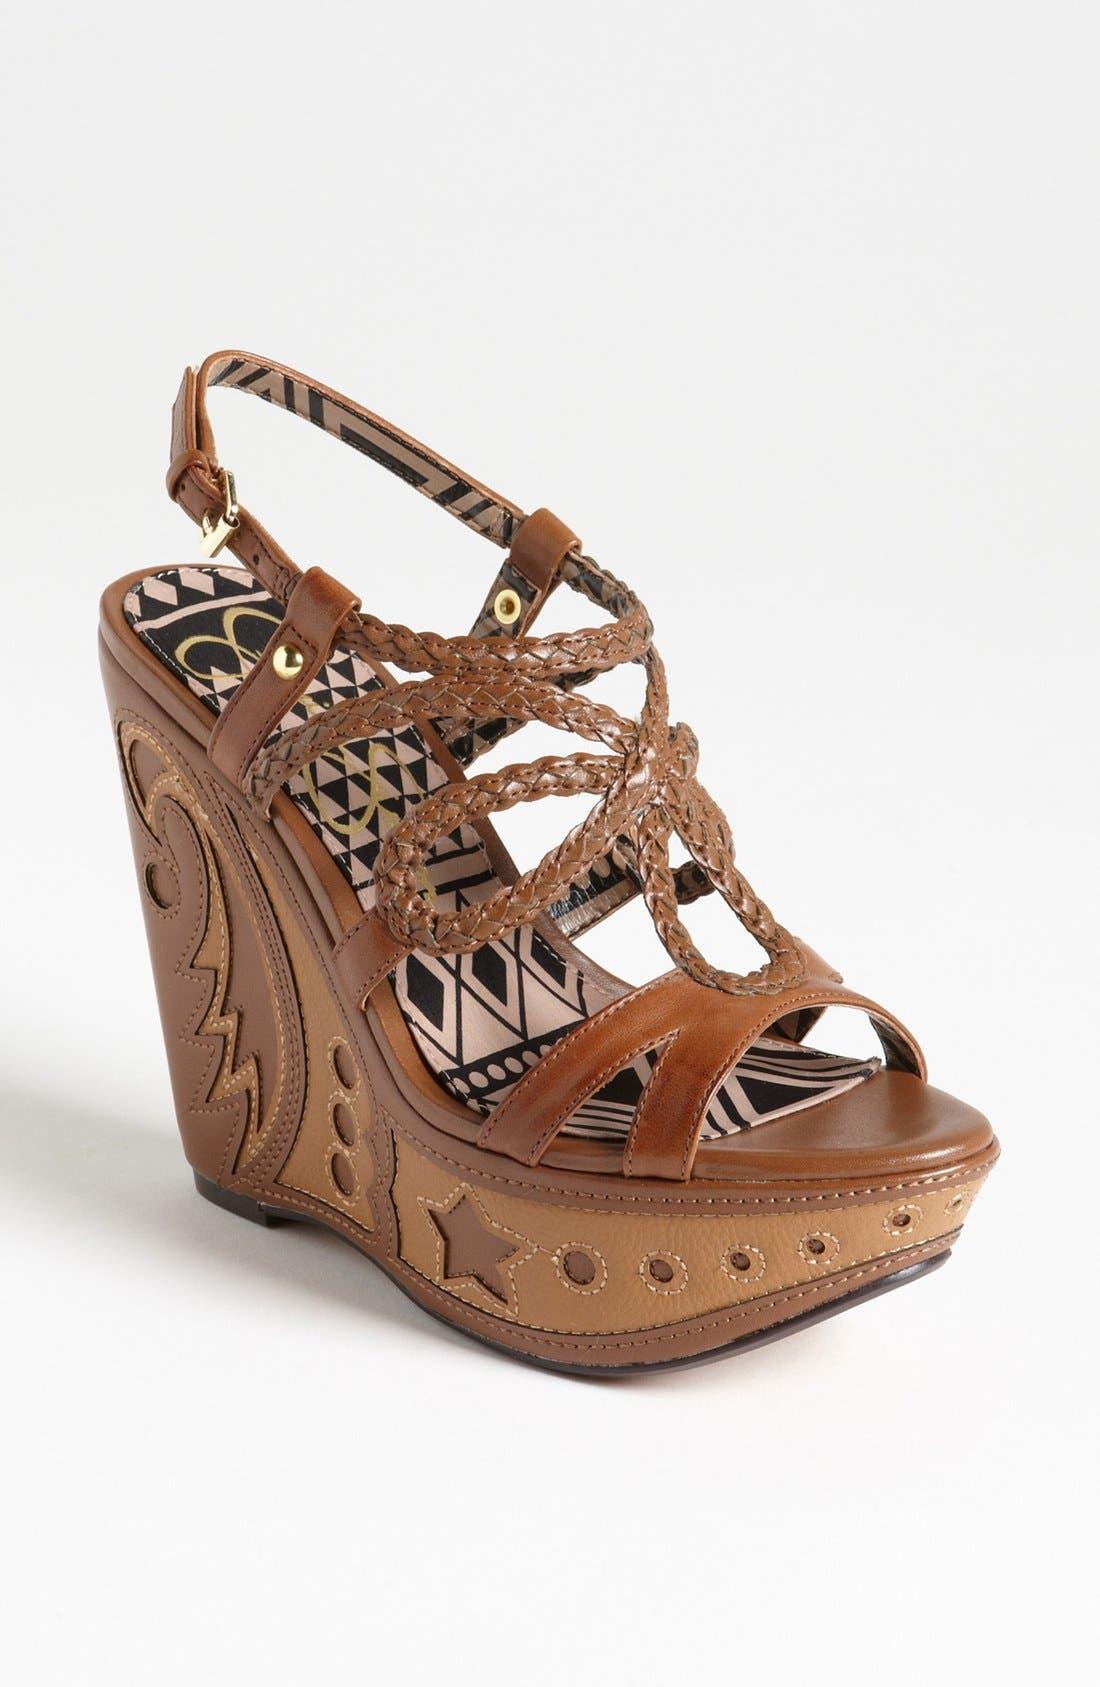 Alternate Image 1 Selected - Jessica Simpson 'Karlier' Sandal